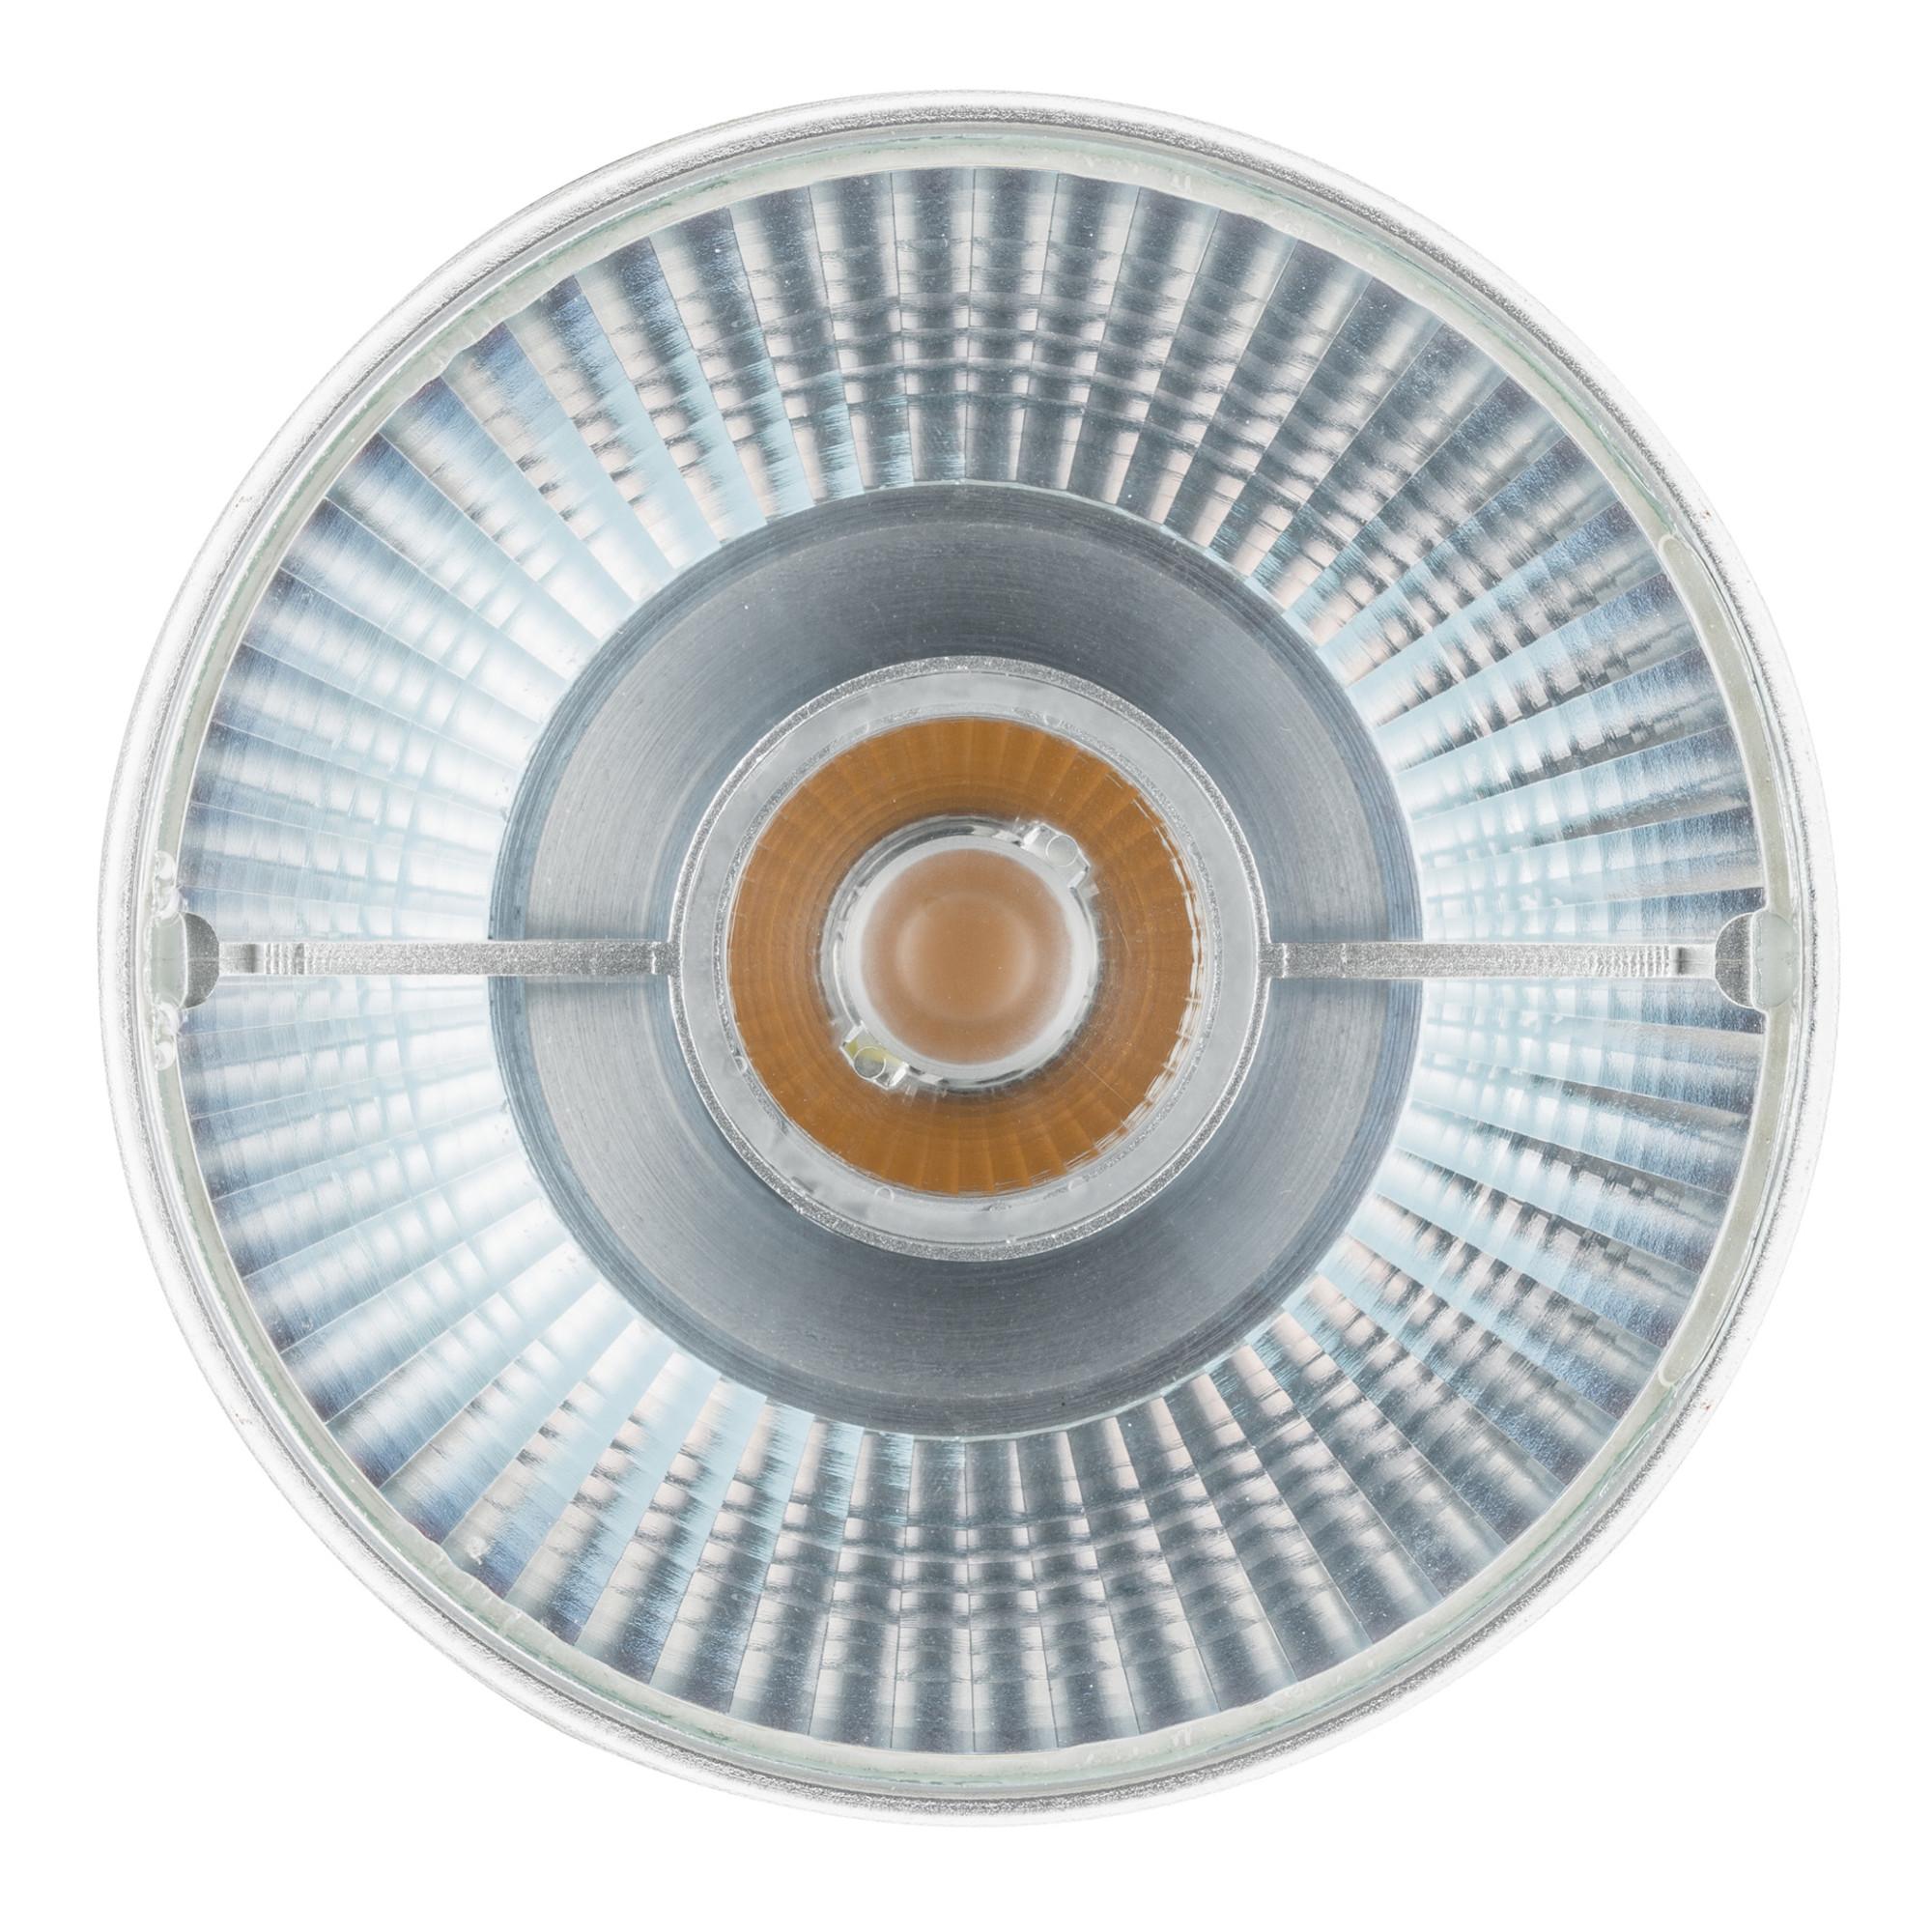 Лампа светодиодная Paulmann 28514 GU10 350 Лм теплый свет